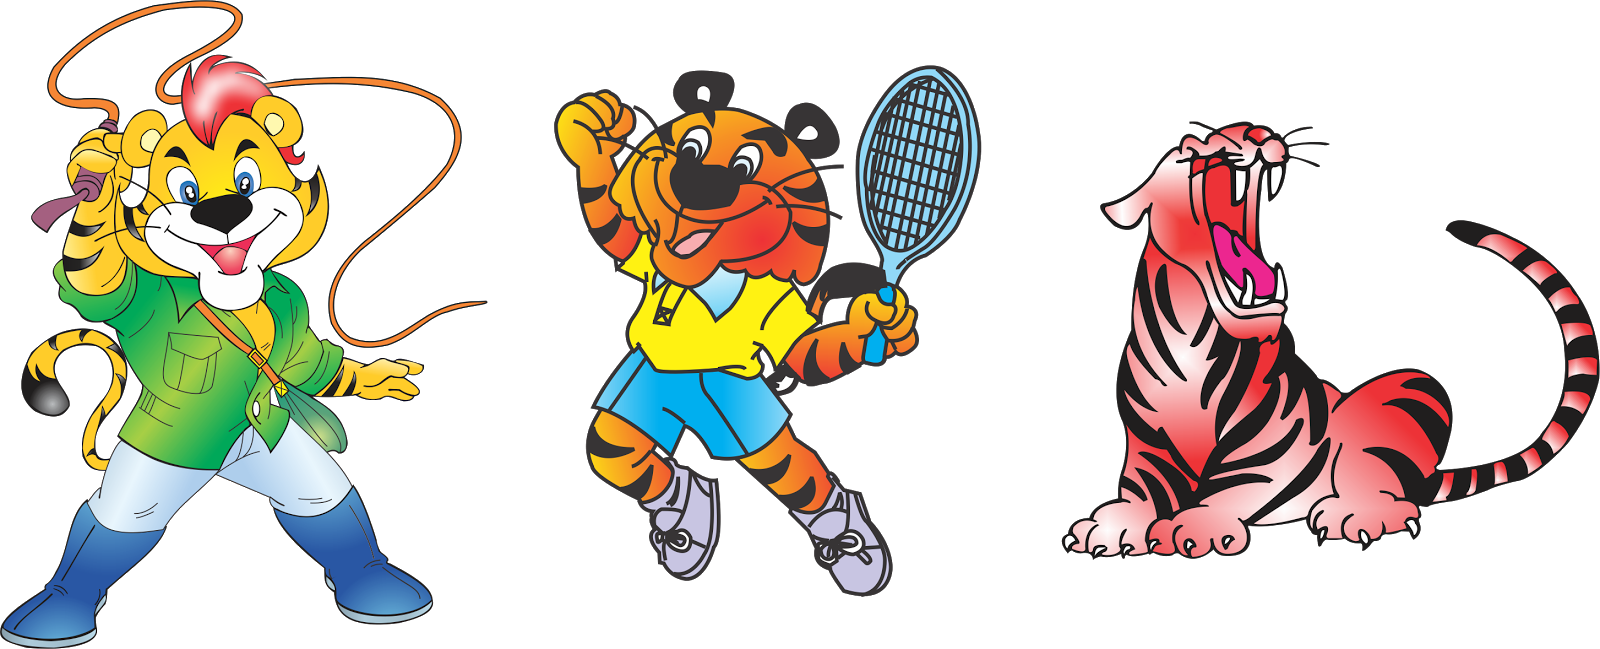 Cartoon Character Design Service : Beautiful d cartoon character designs for comic share khan